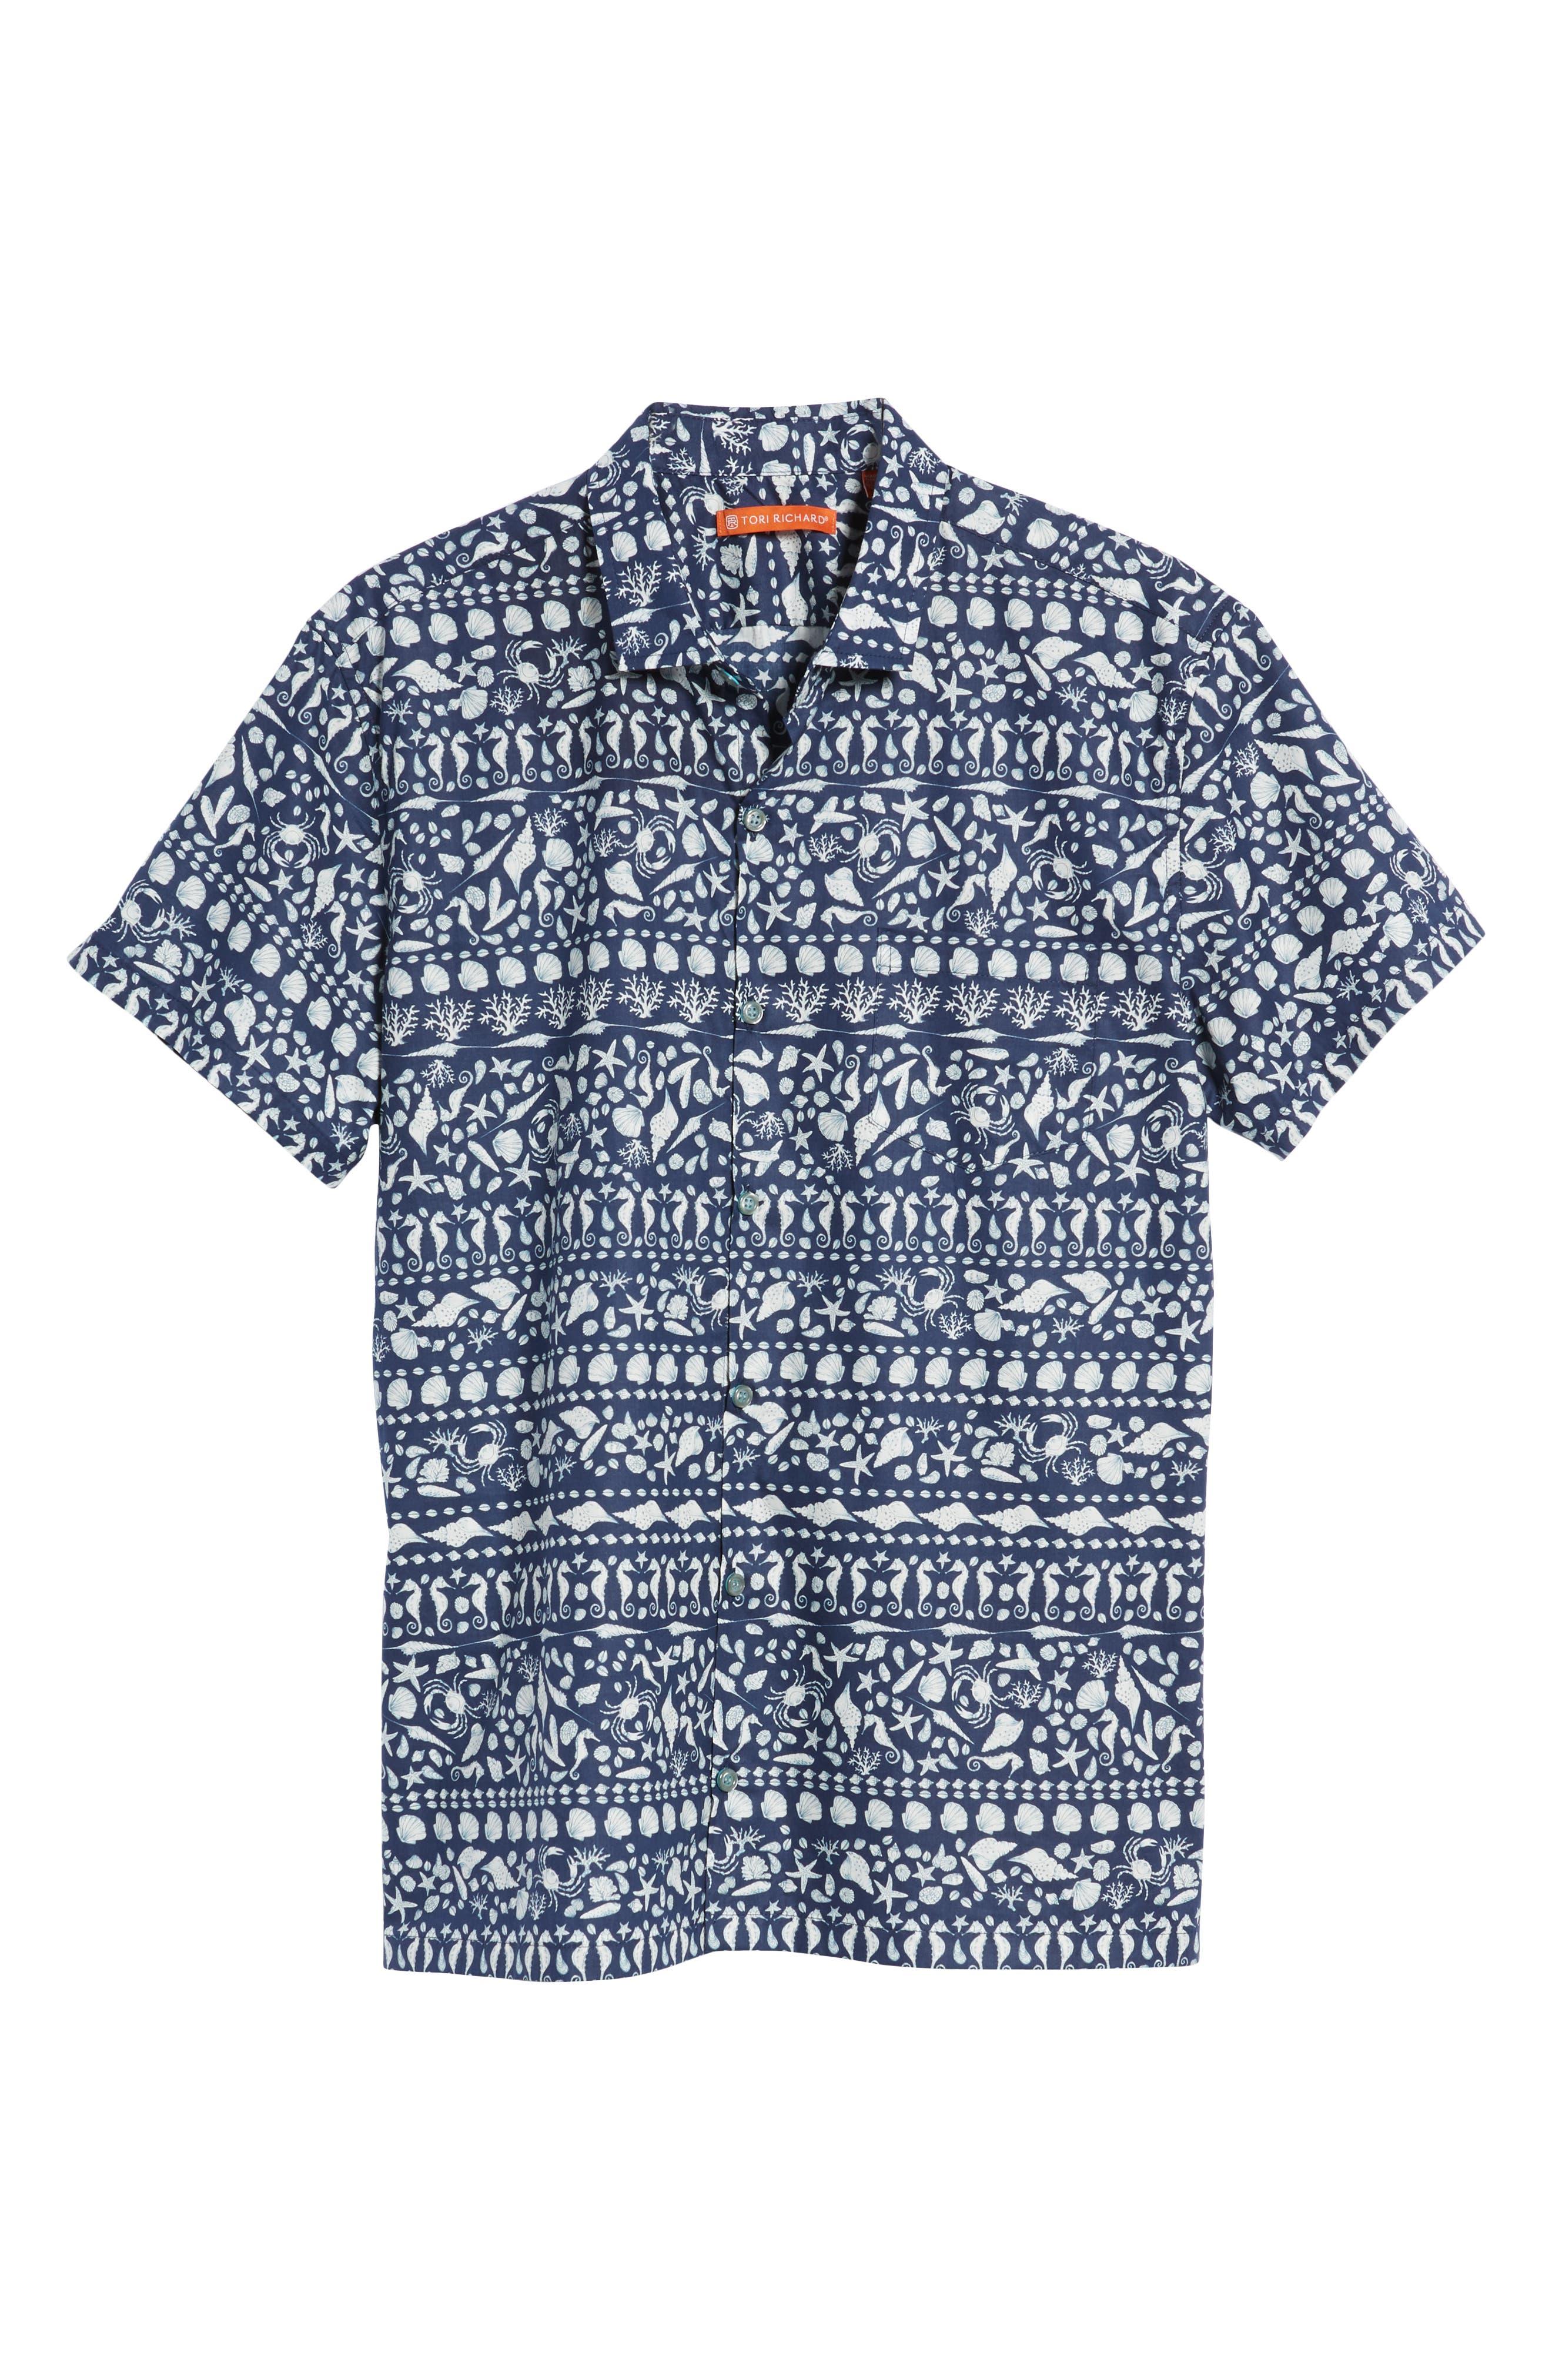 Lord Shells Trim Fit Camp Shirt,                             Alternate thumbnail 6, color,                             NAVY